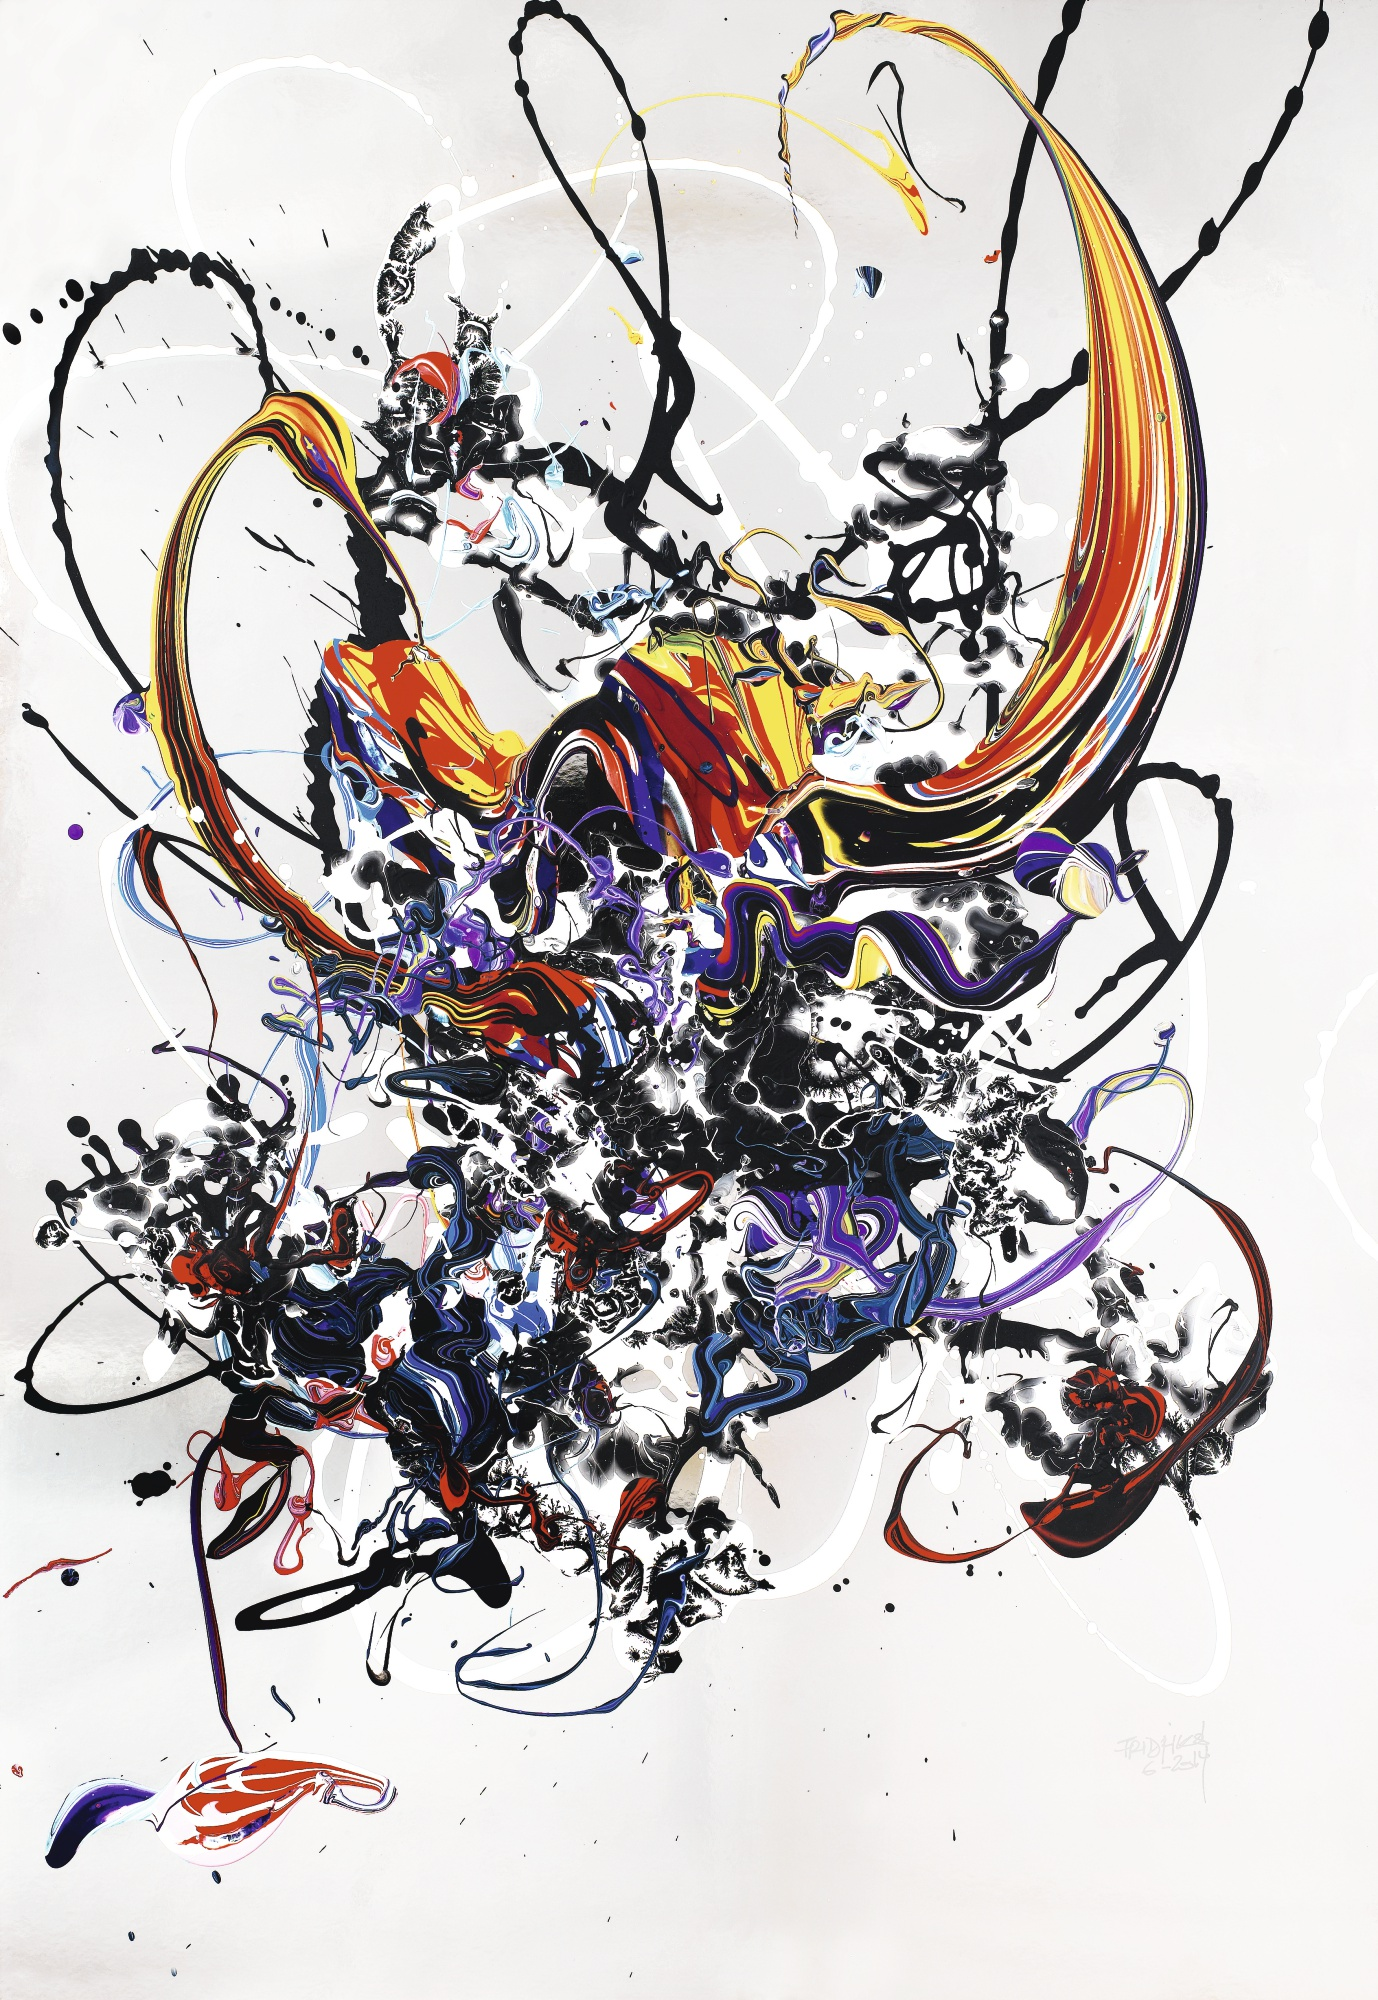 Katrin Fridriks-Skylanders - Reflected Paper No. 6-2014